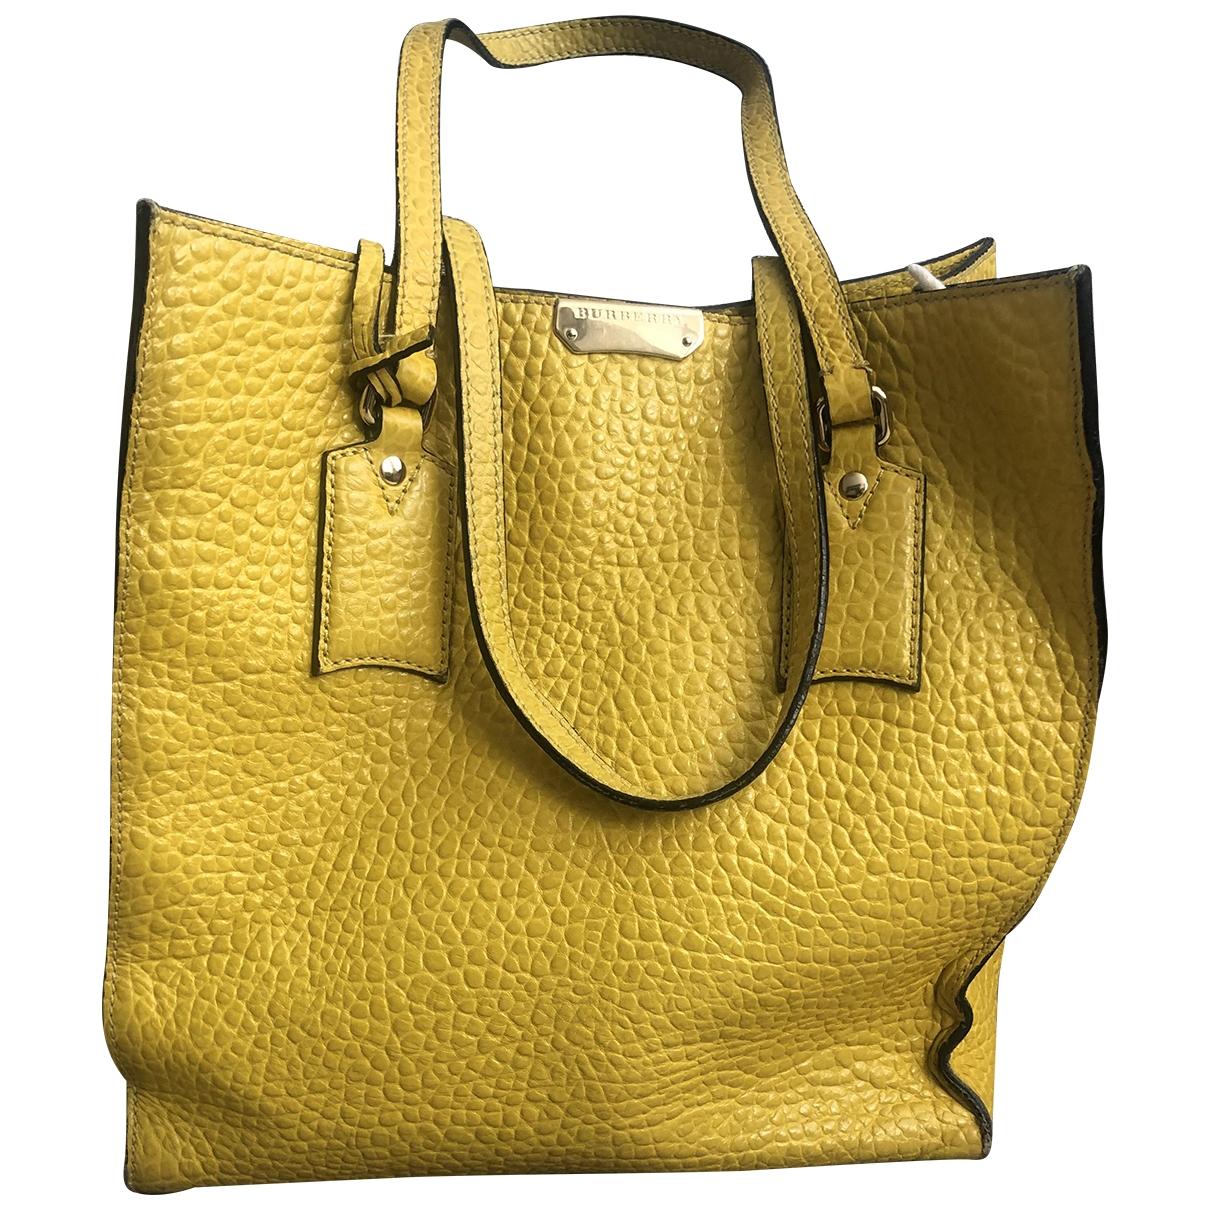 Burberry \N Handtasche in  Gelb Leder